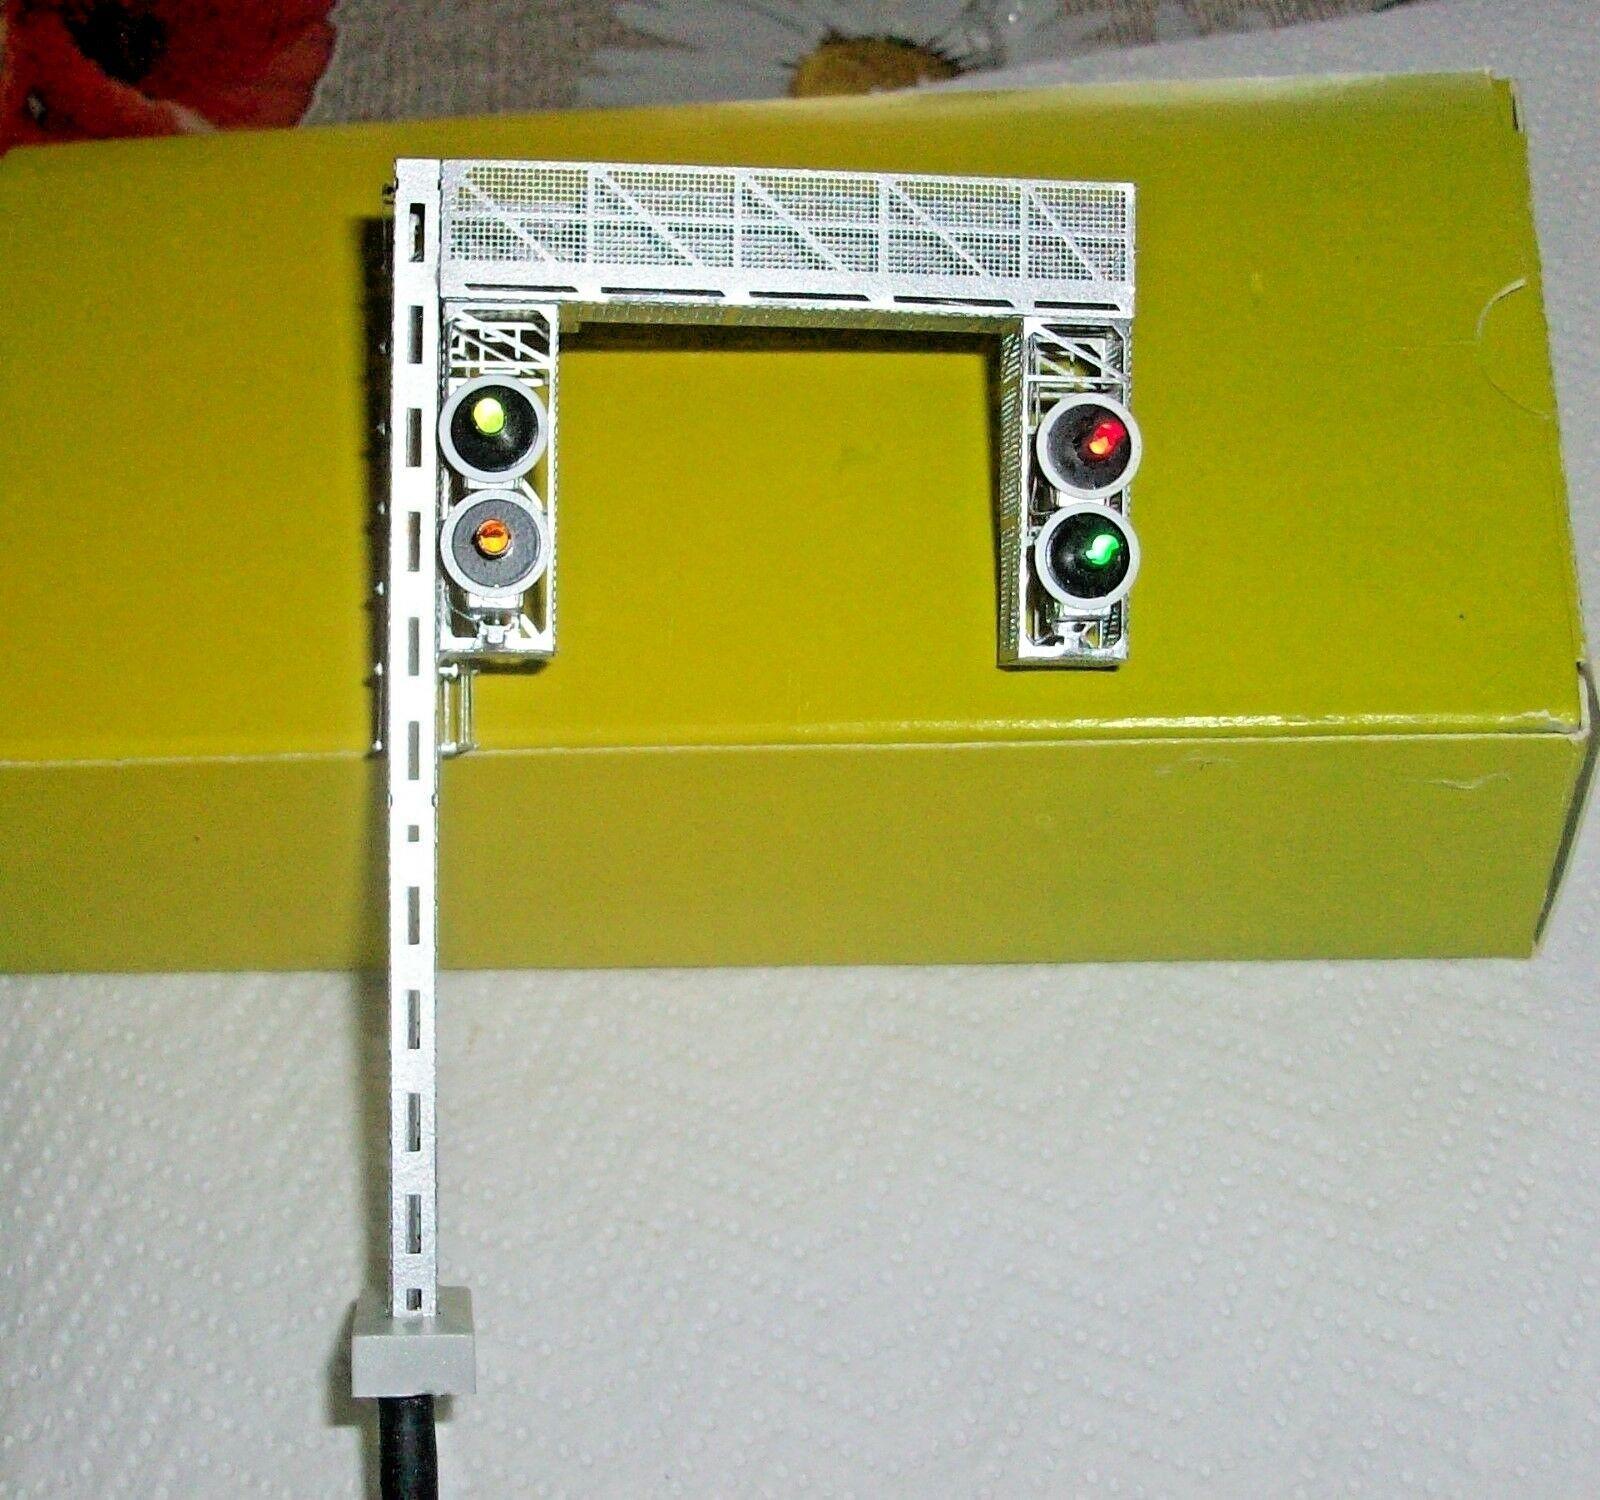 HO Scale Signal to Portal FS 4 Sails 1 ° Cat. Lights R V-V G LED cod.325 NEW